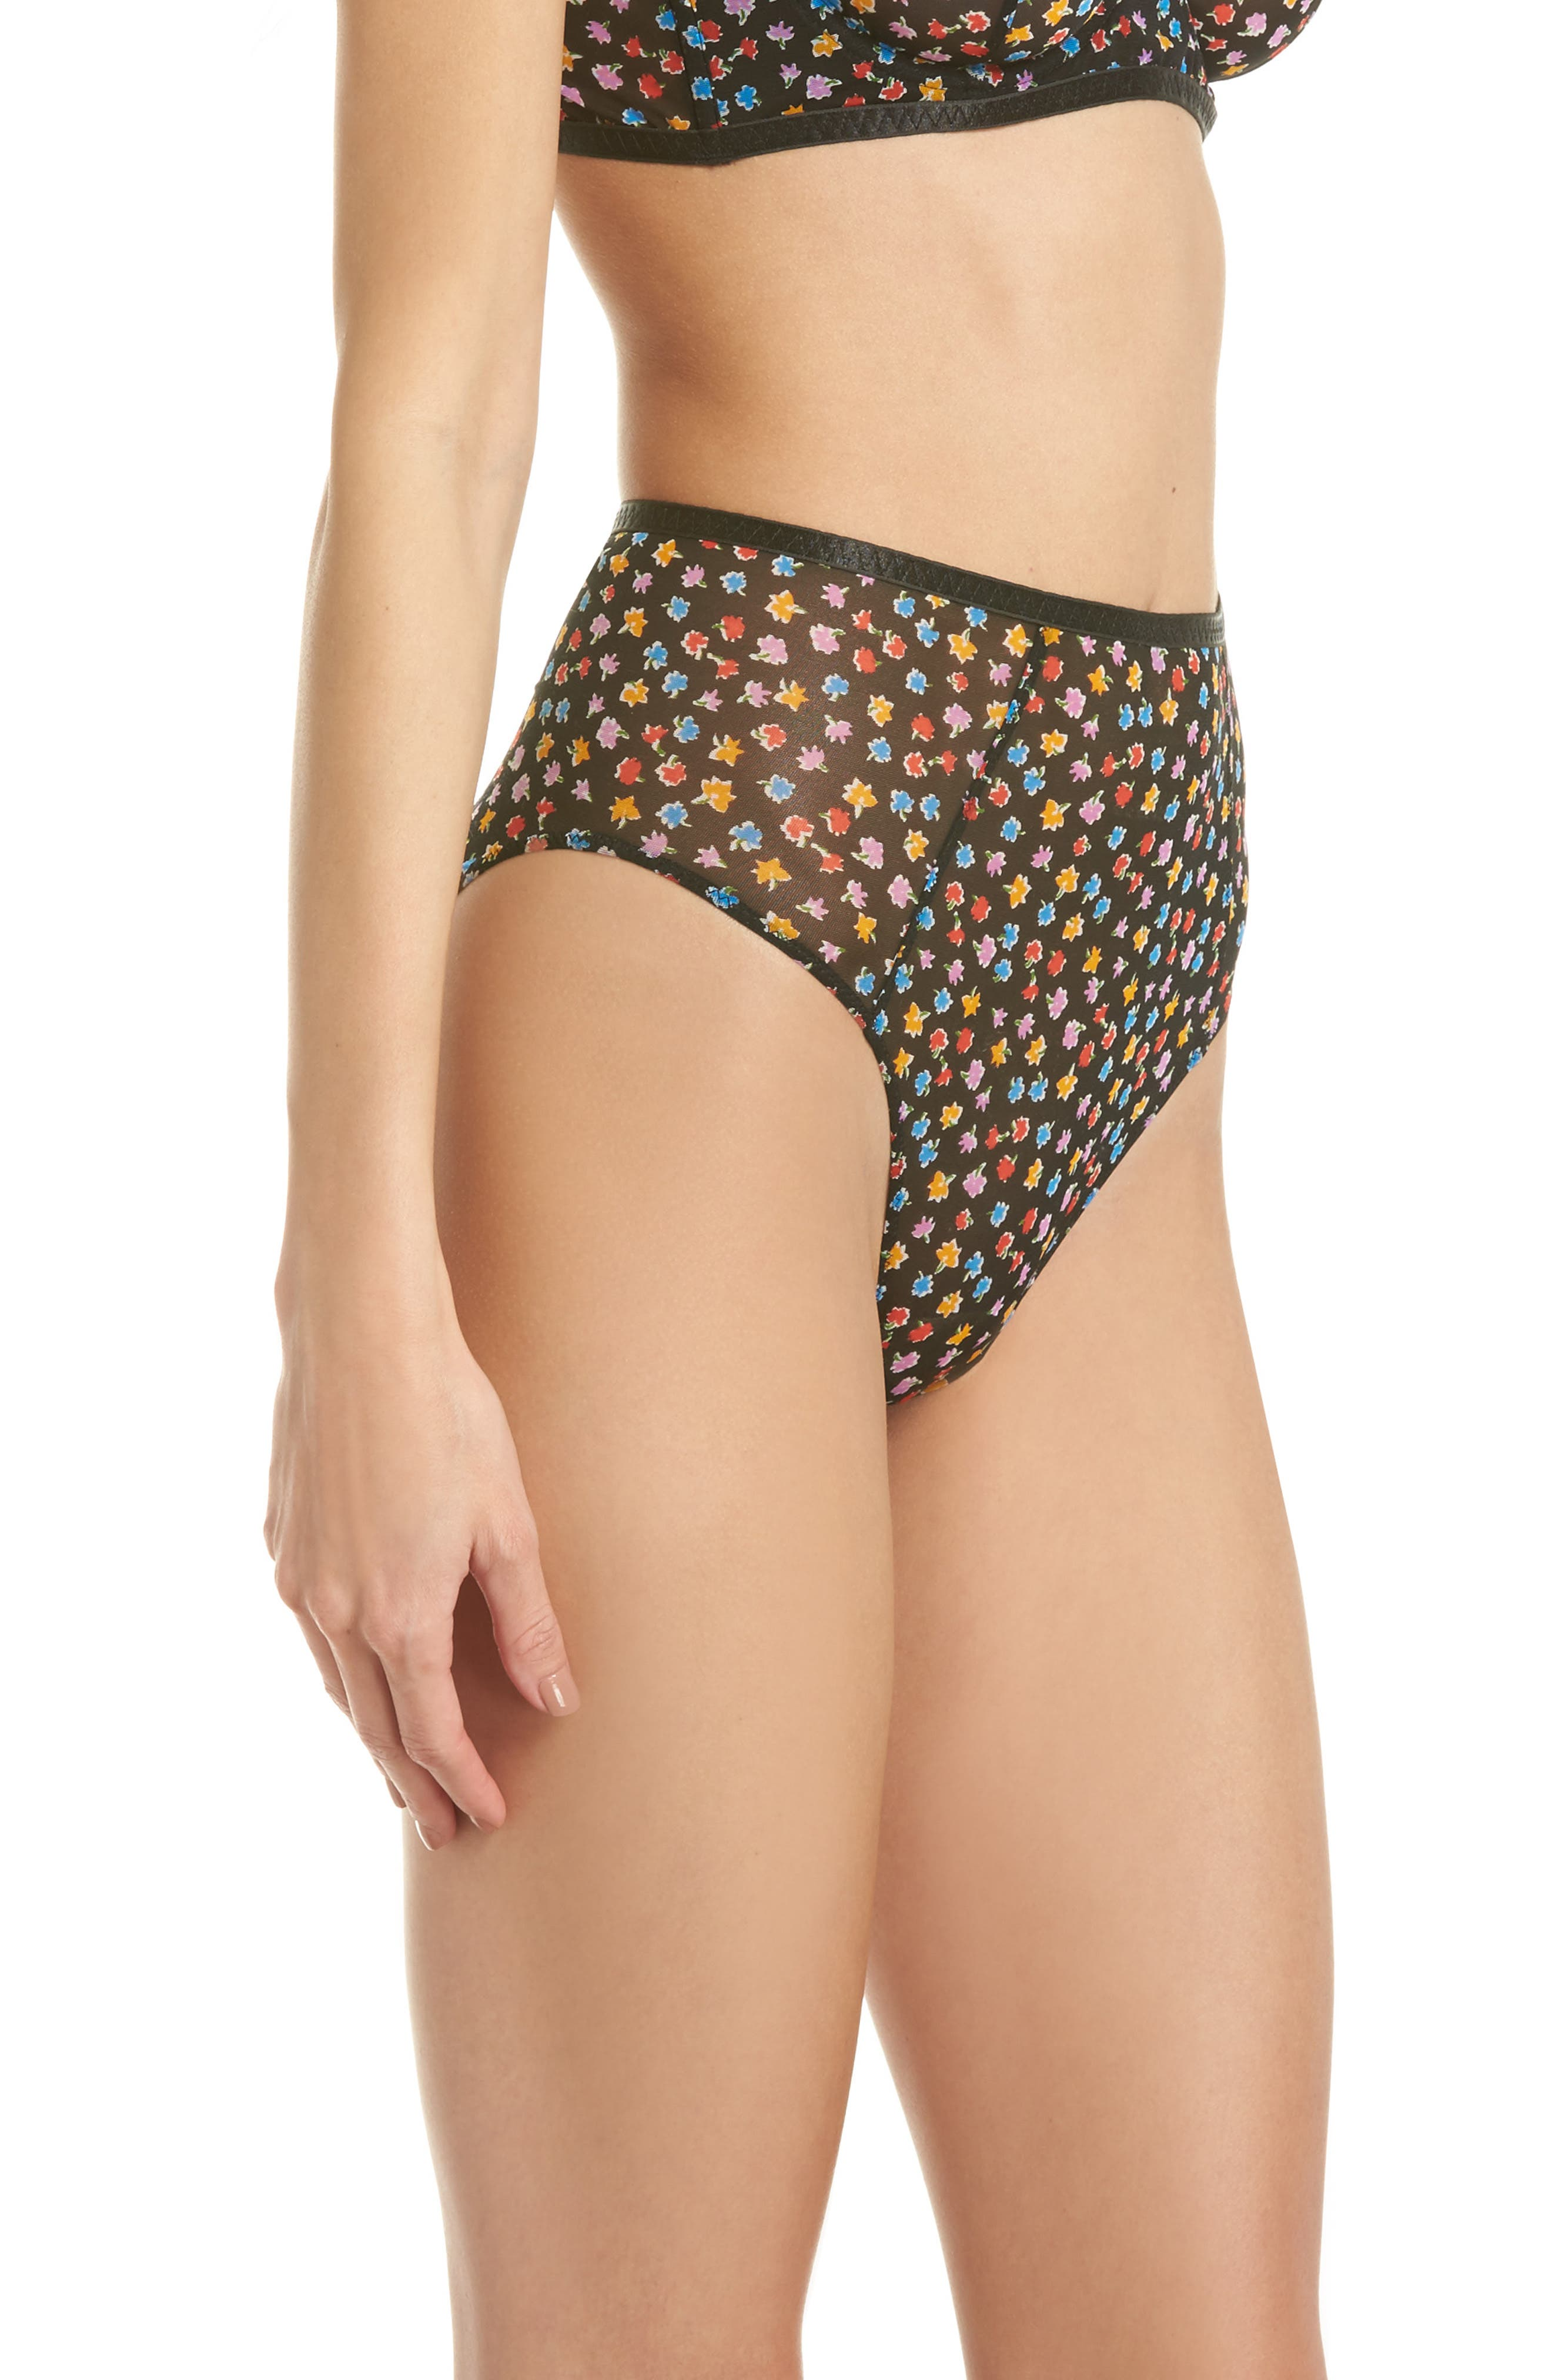 Intimately FP Capri High Waist Panties,                             Alternate thumbnail 3, color,                             Black Combo